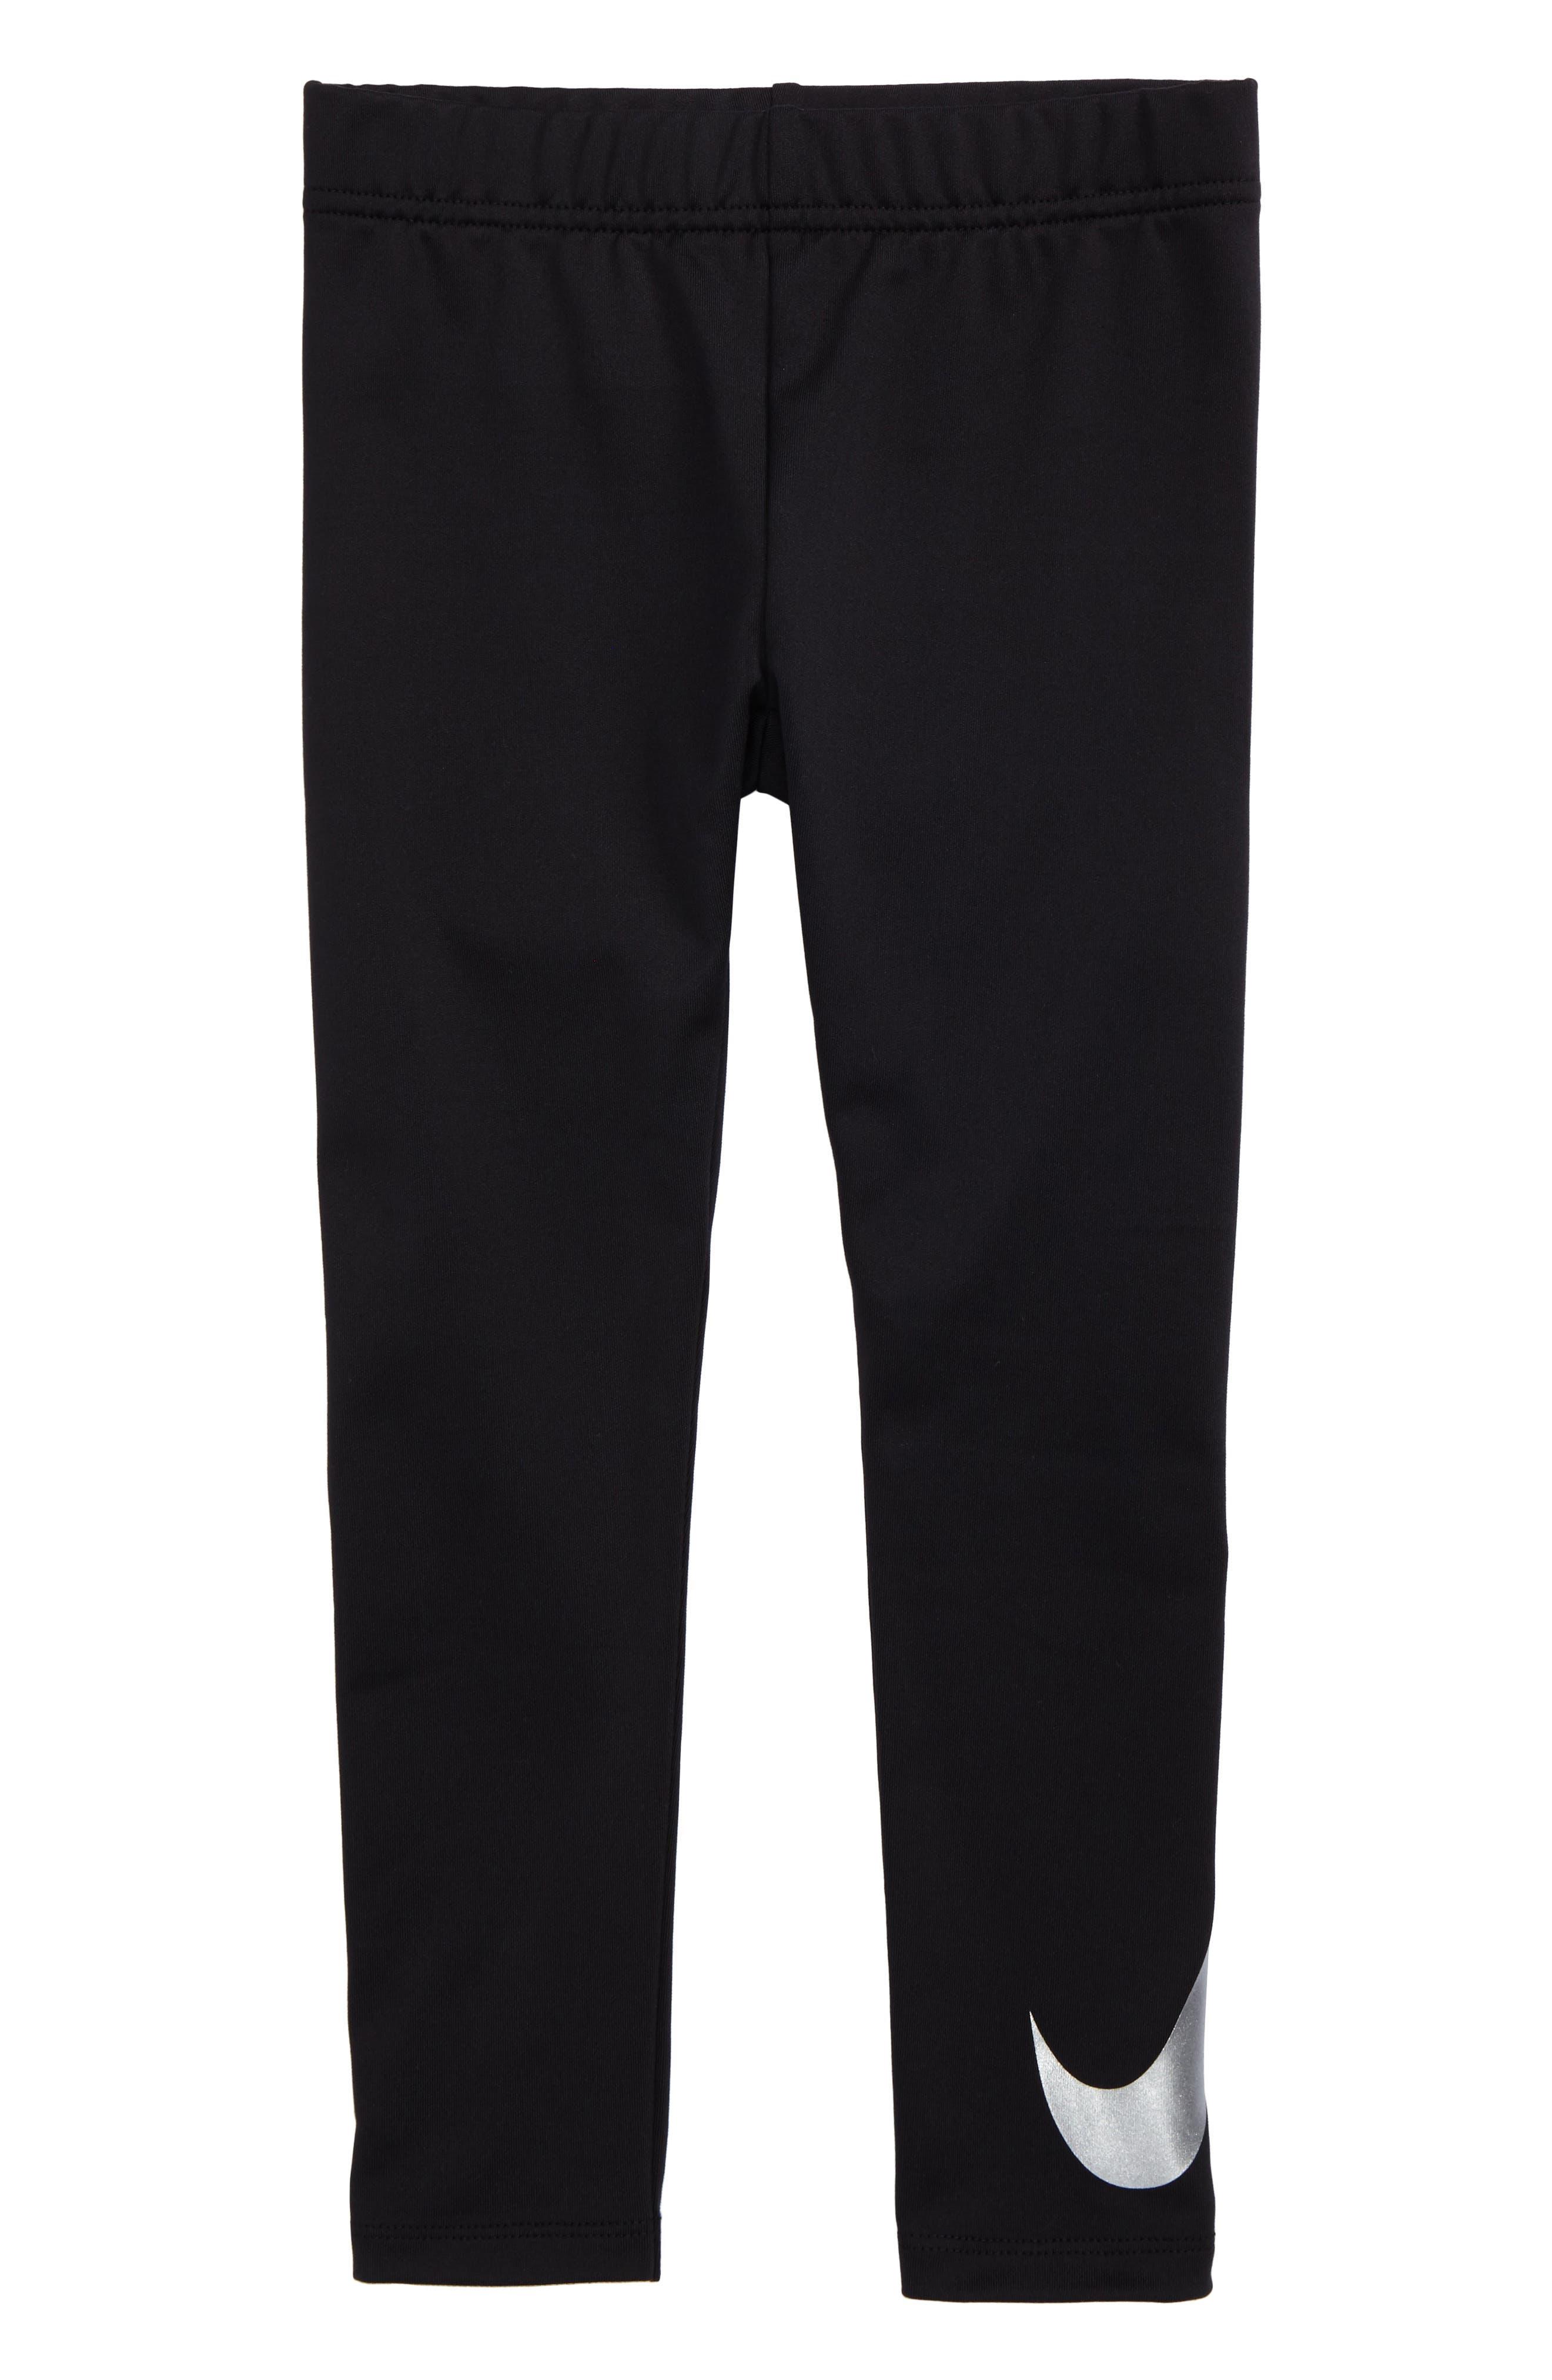 Dry Iridescent Leggings,                             Main thumbnail 1, color,                             BLACK